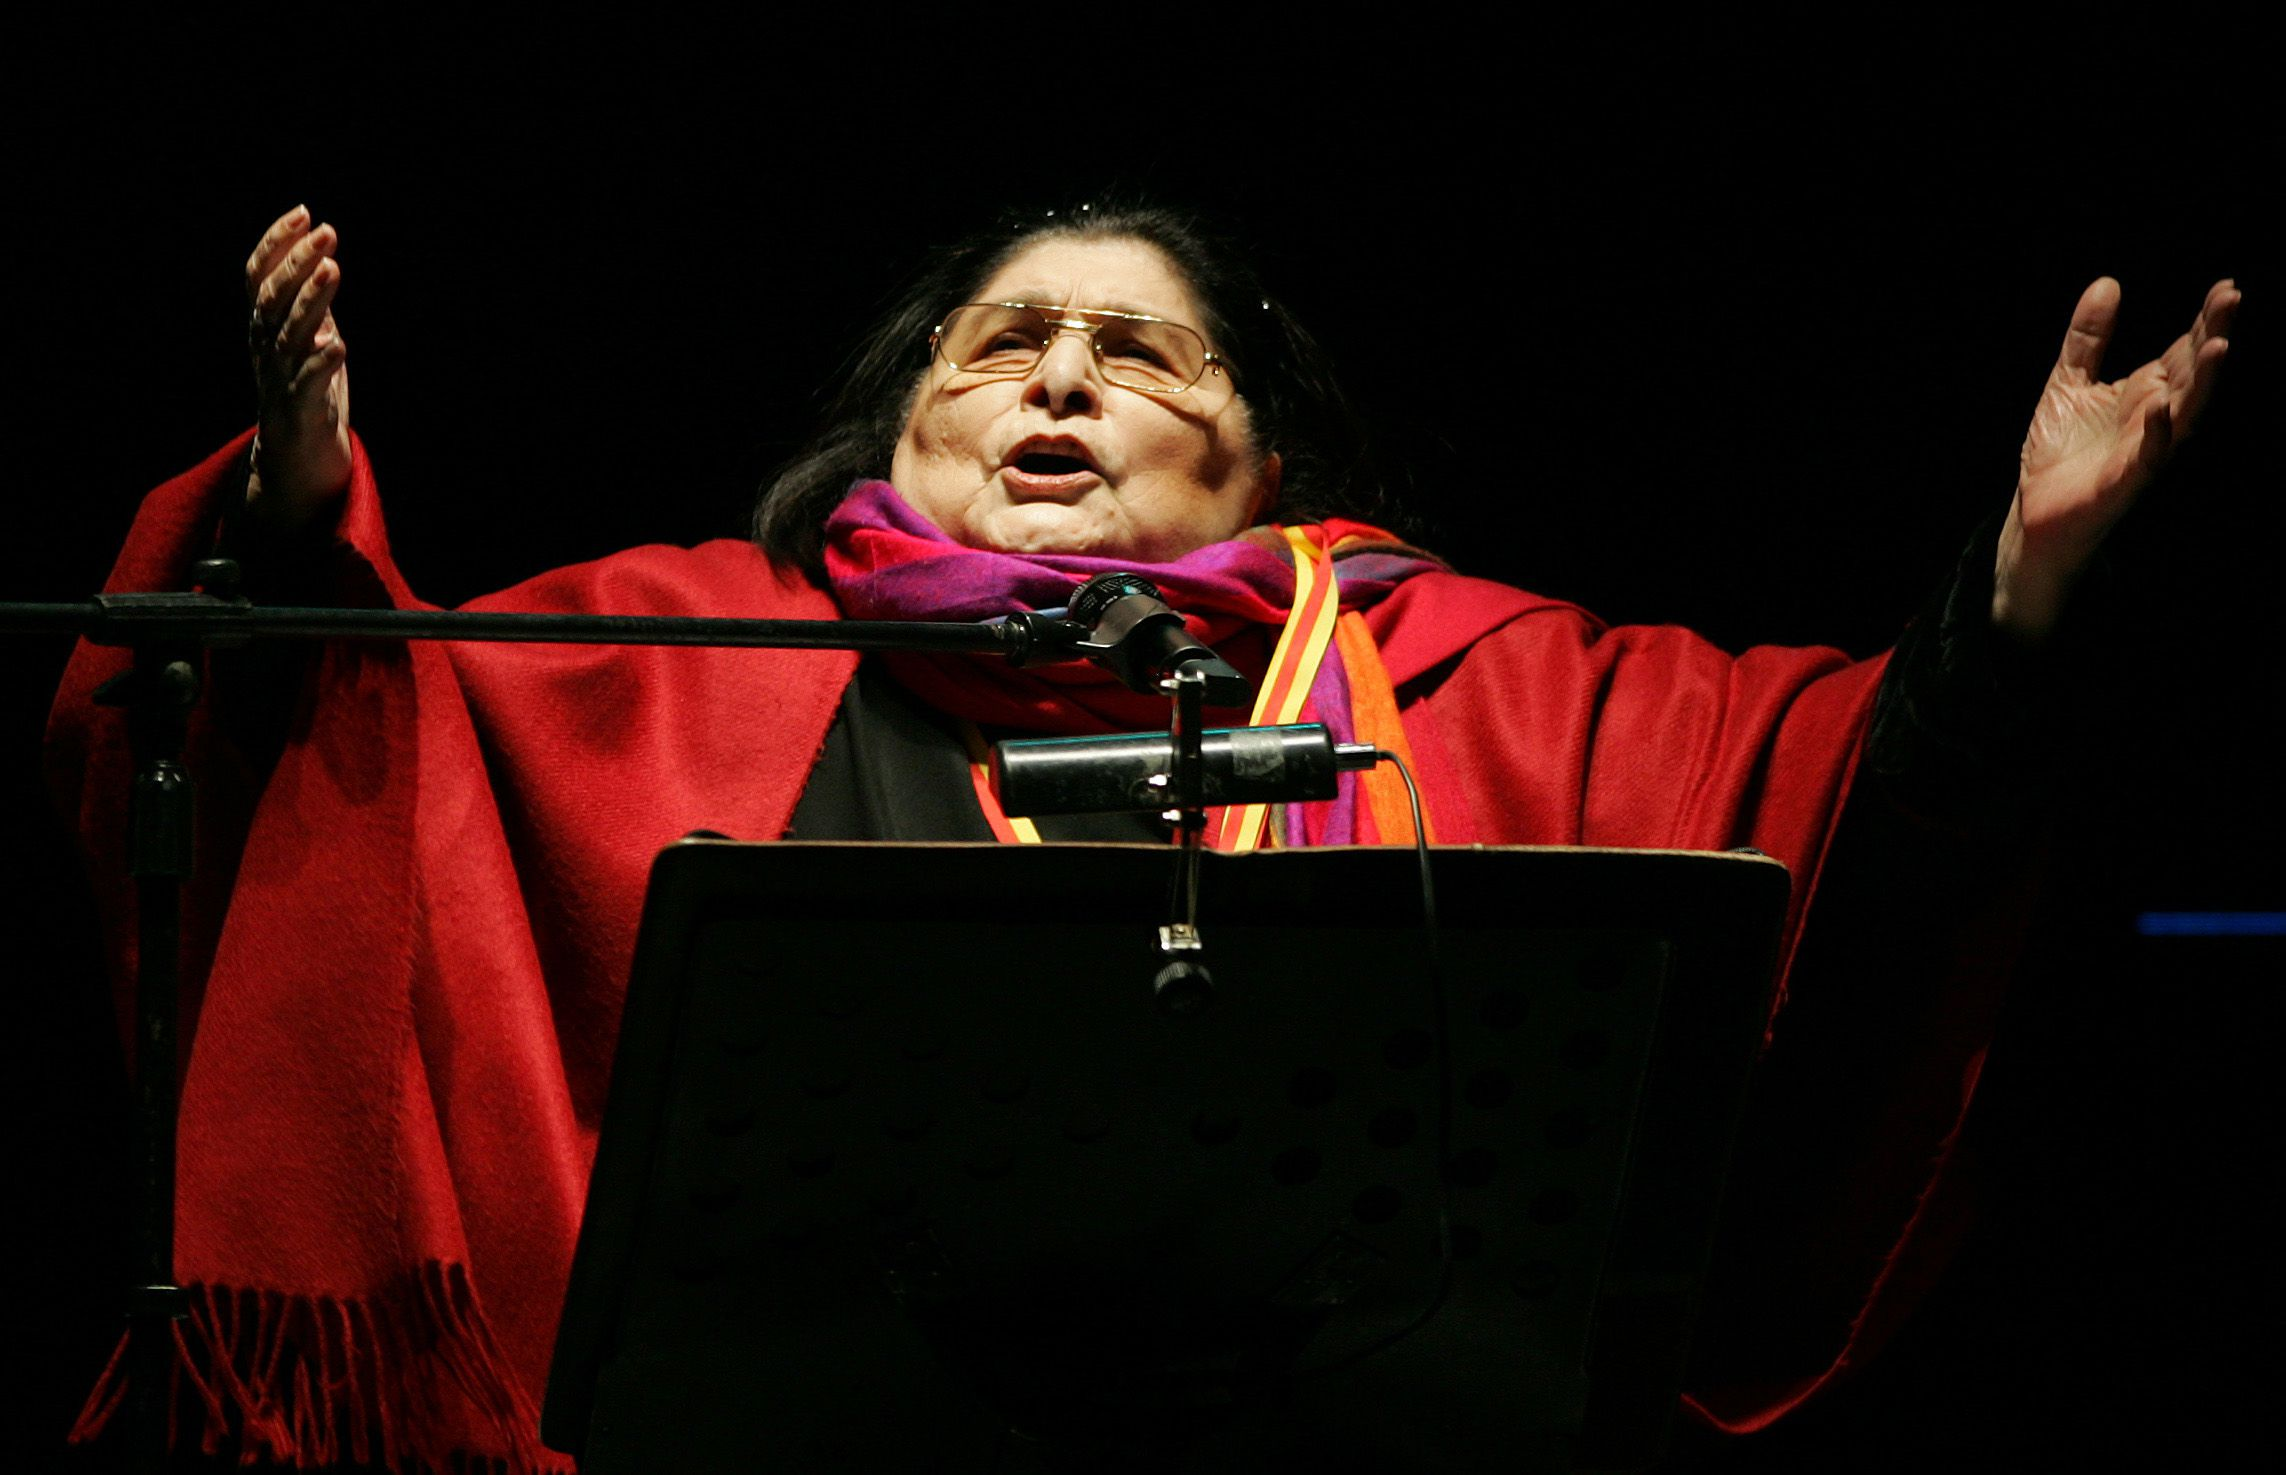 """Cantamos a Mercedes Sosa"" será este sábado en el Centro Cultural Kirchner (Foto: AP/ Dolores Ochoa)"